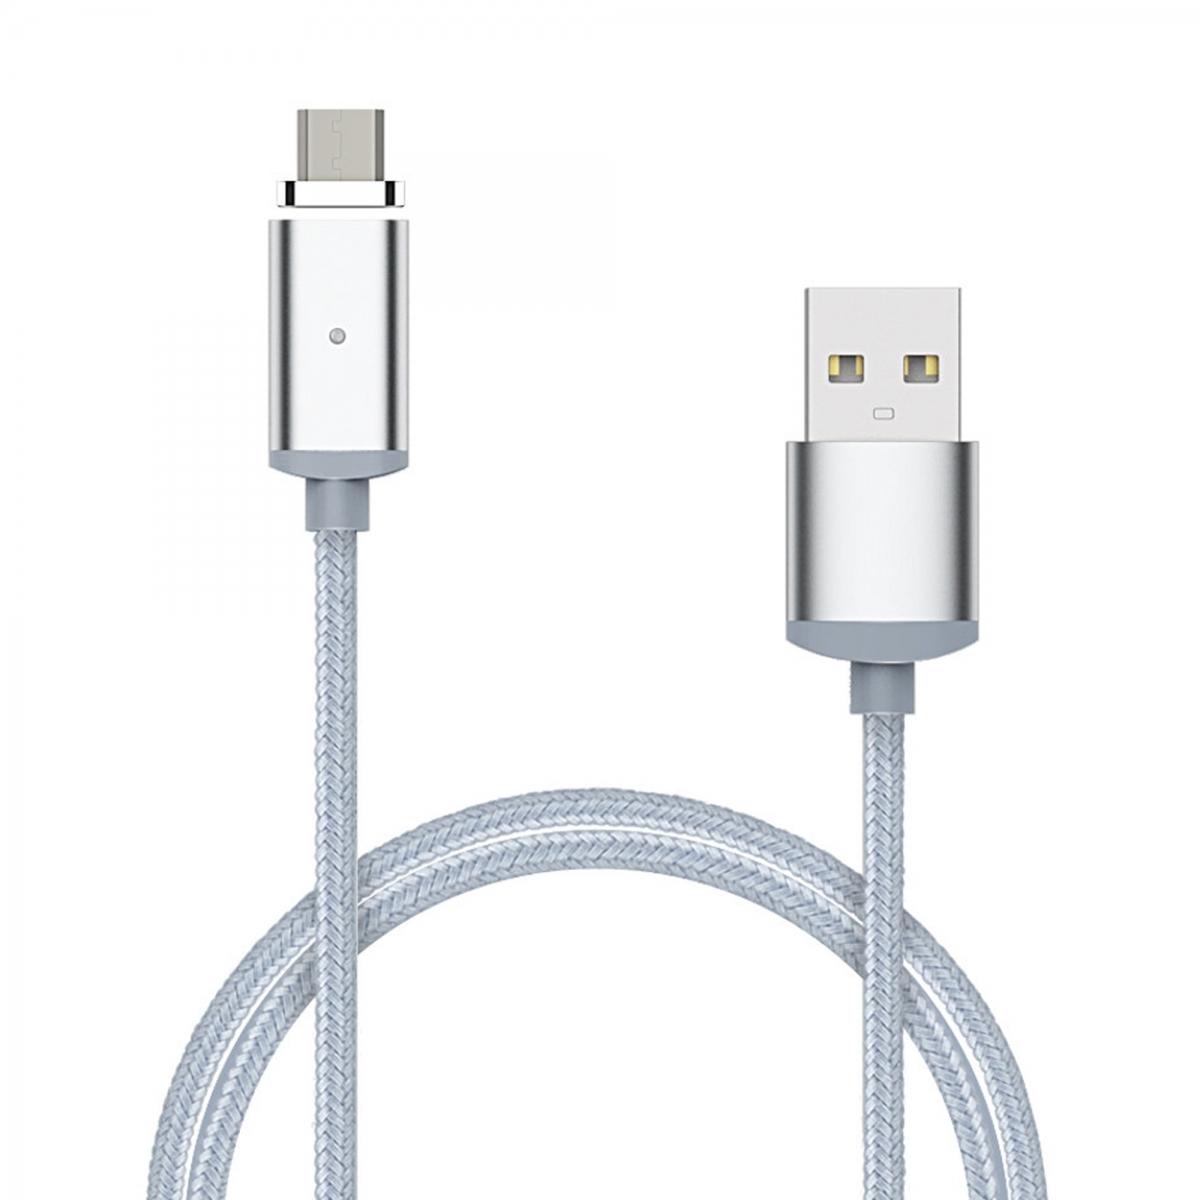 MİCRO MAGNET USB KABLOSU MANYETİK UÇLU